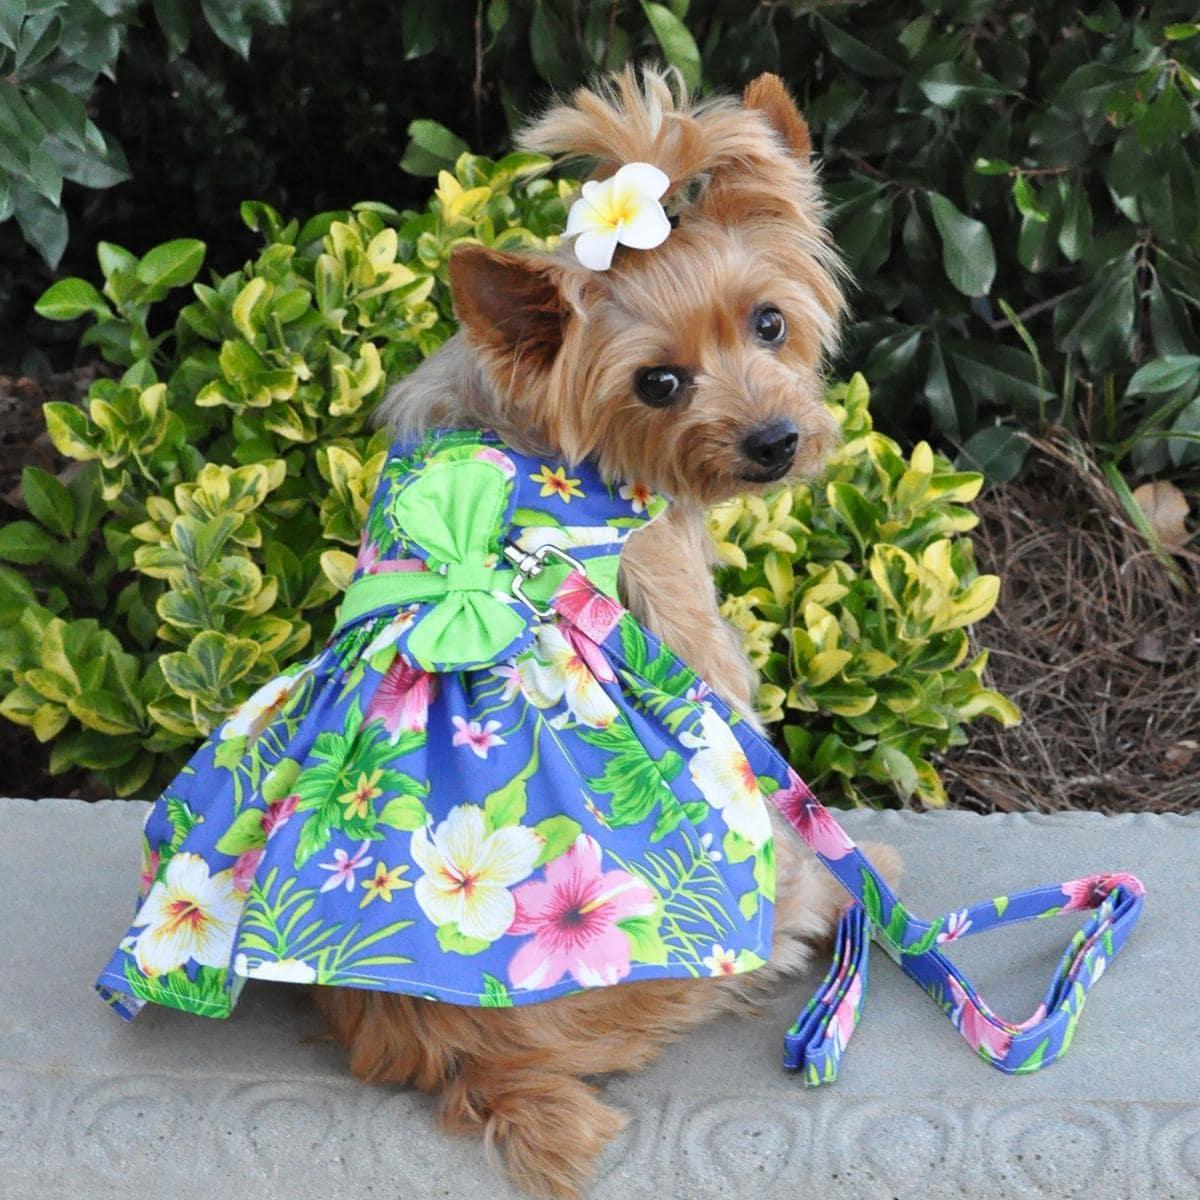 Blue Lagoon Hawaiian Hibiscus Dog Dress with Matching Leash by Doggie Design (X-Small)